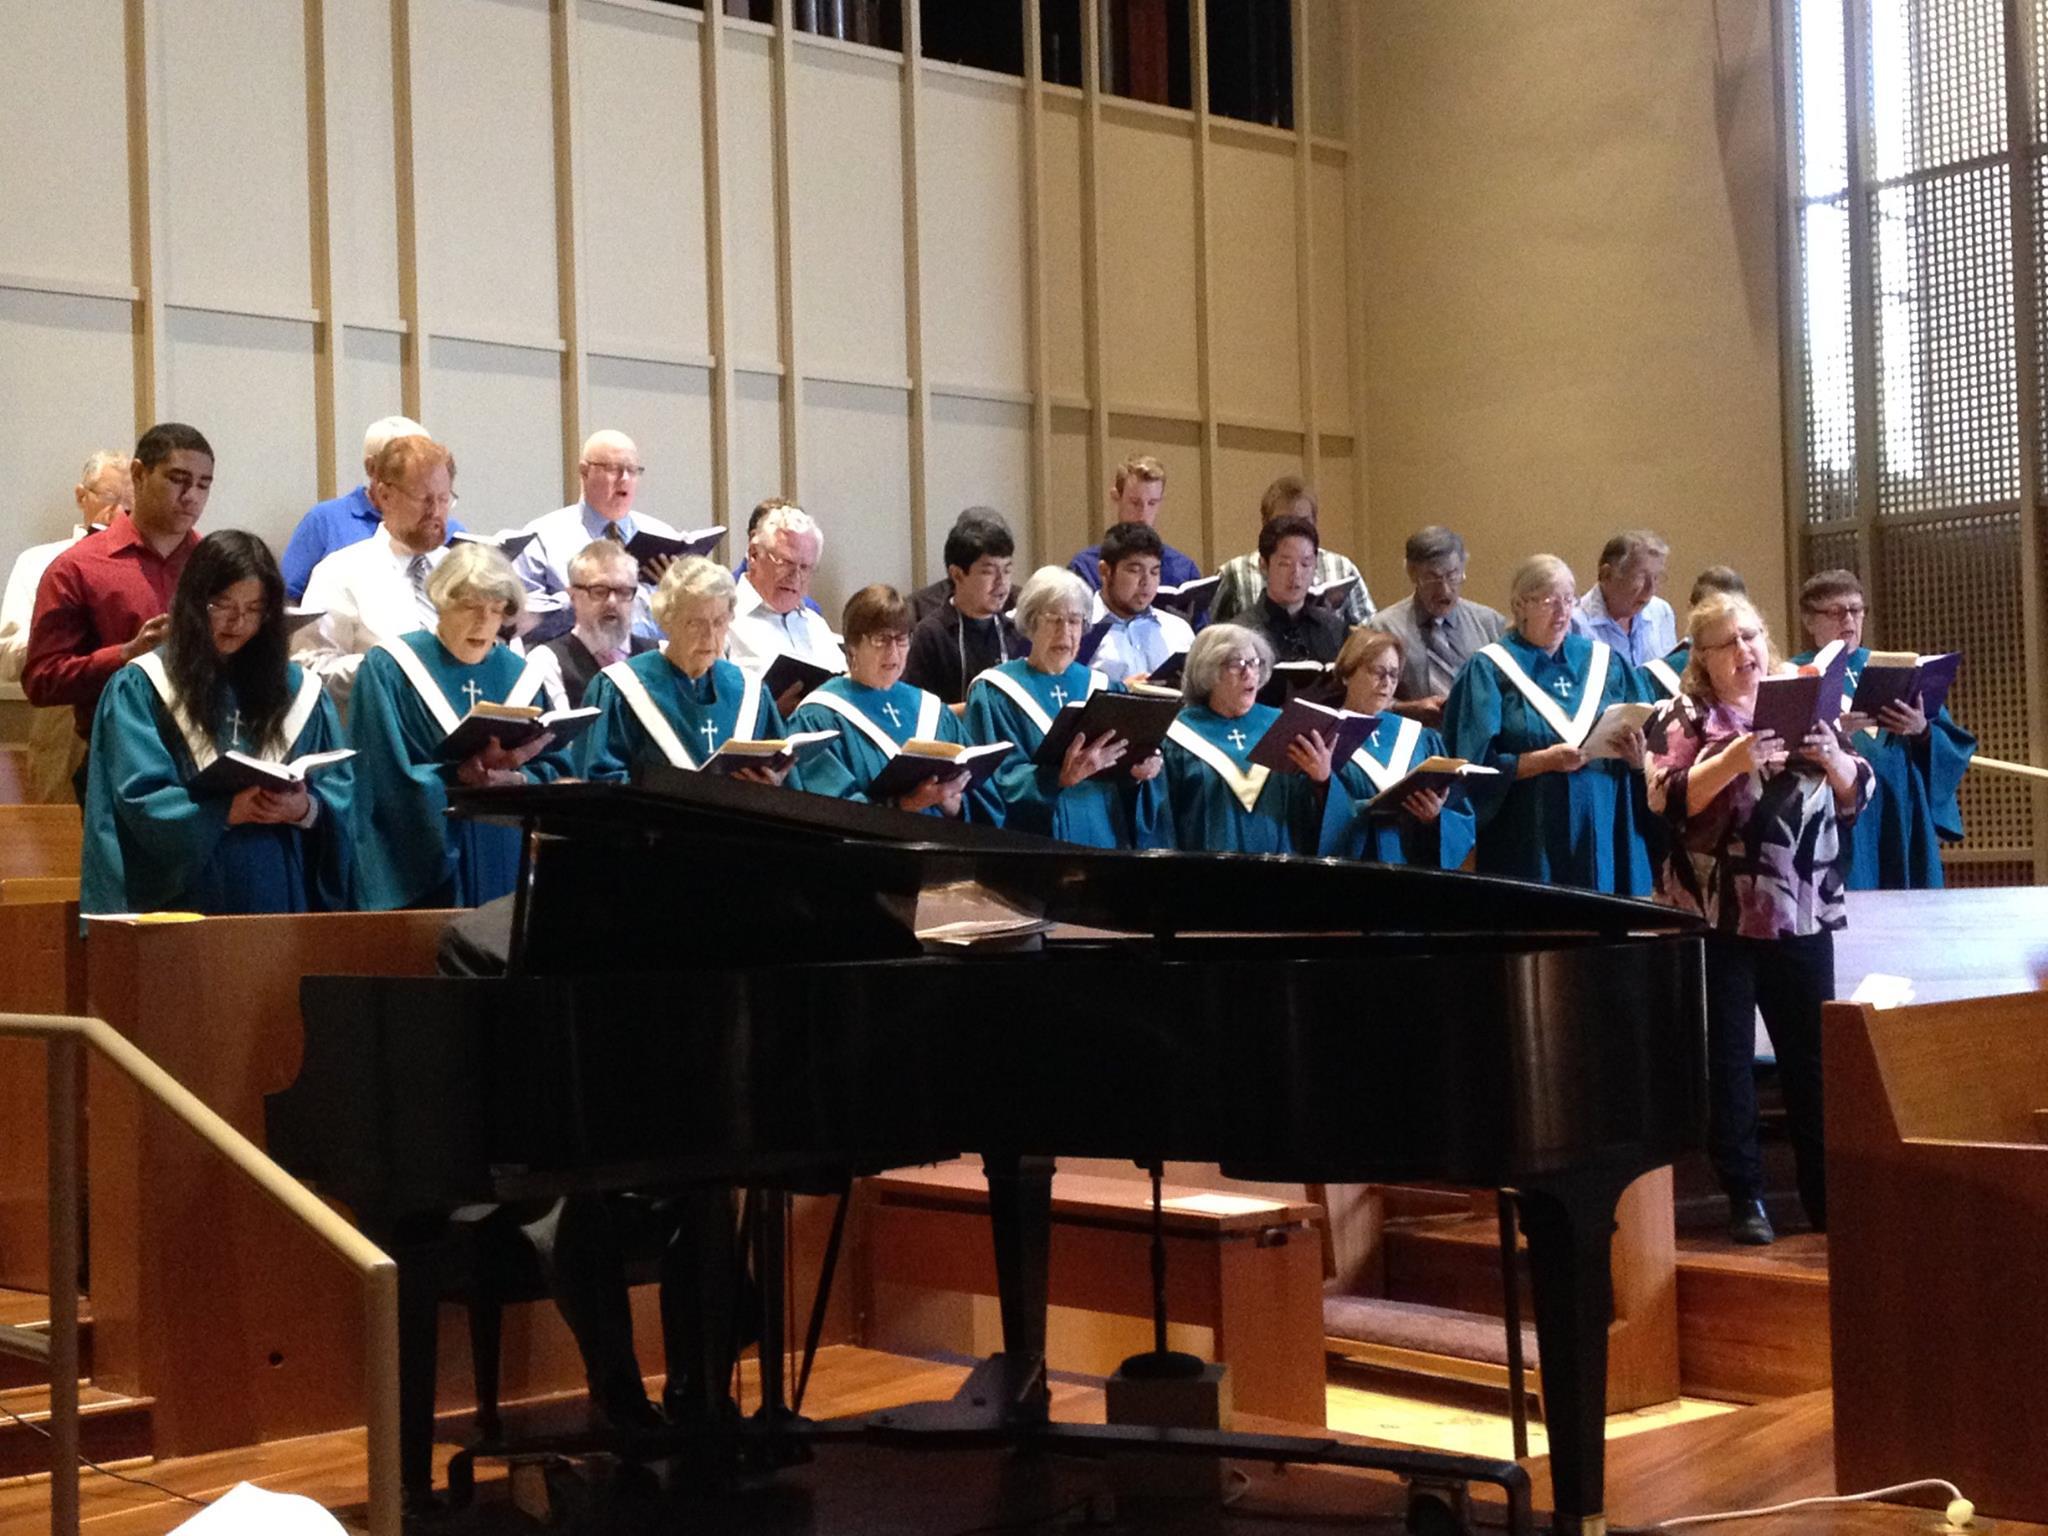 claremont-presbyterian-church-choir-7.jpg